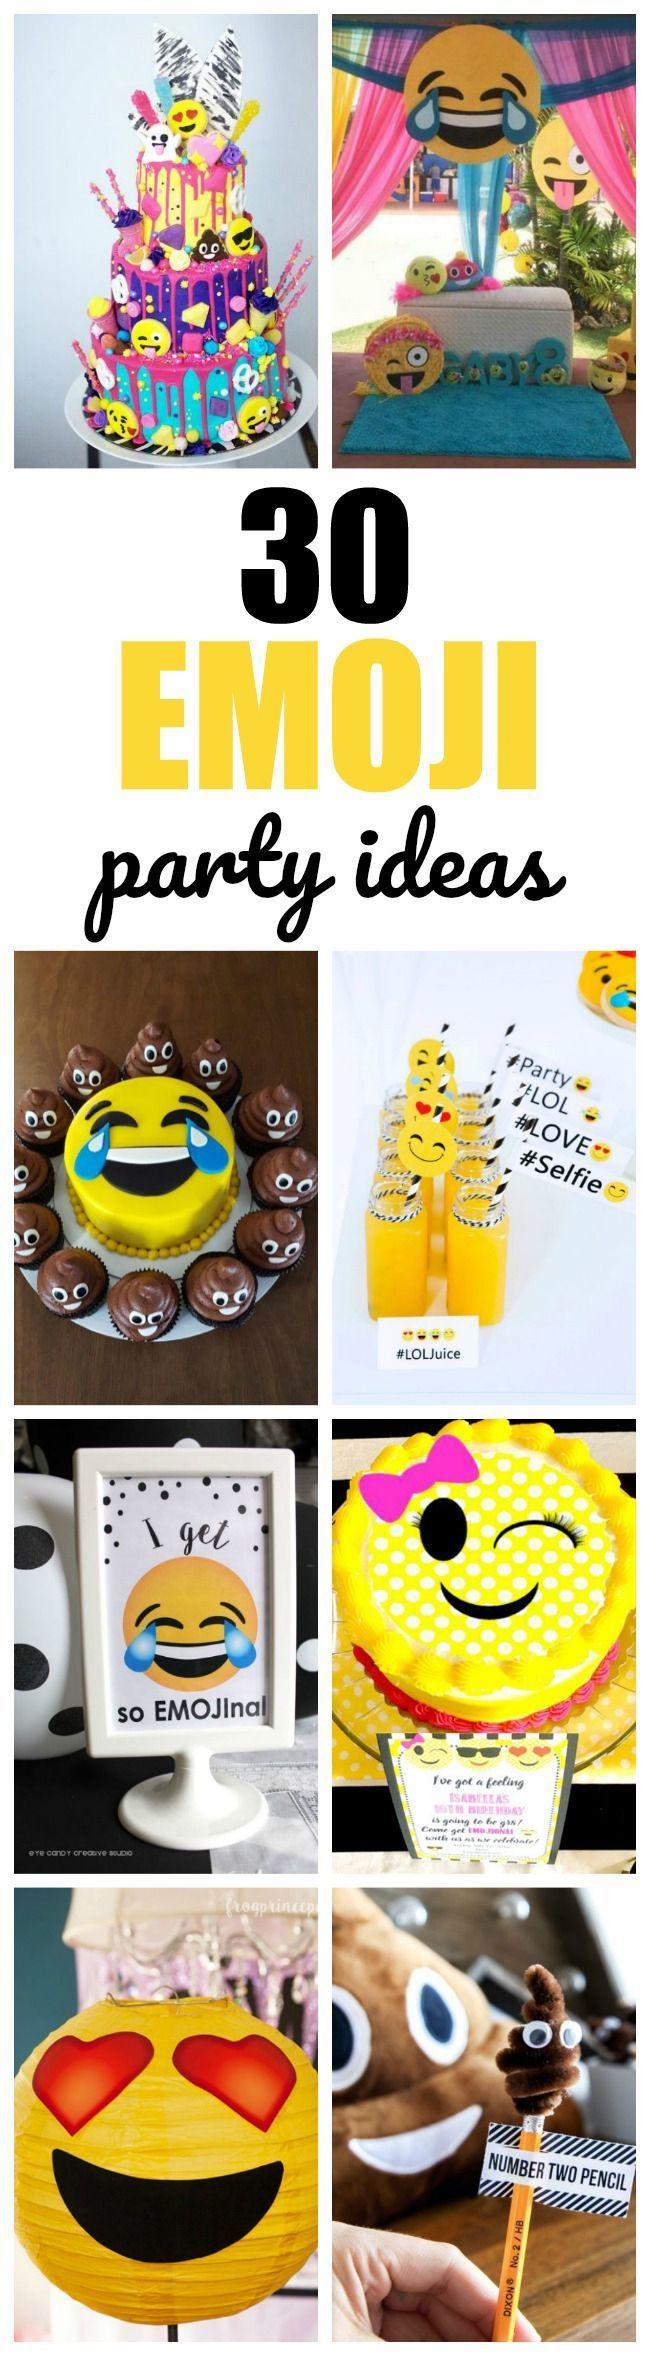 30 Totally Amazing Emoji Birthday Party Ideas | Pretty My Party